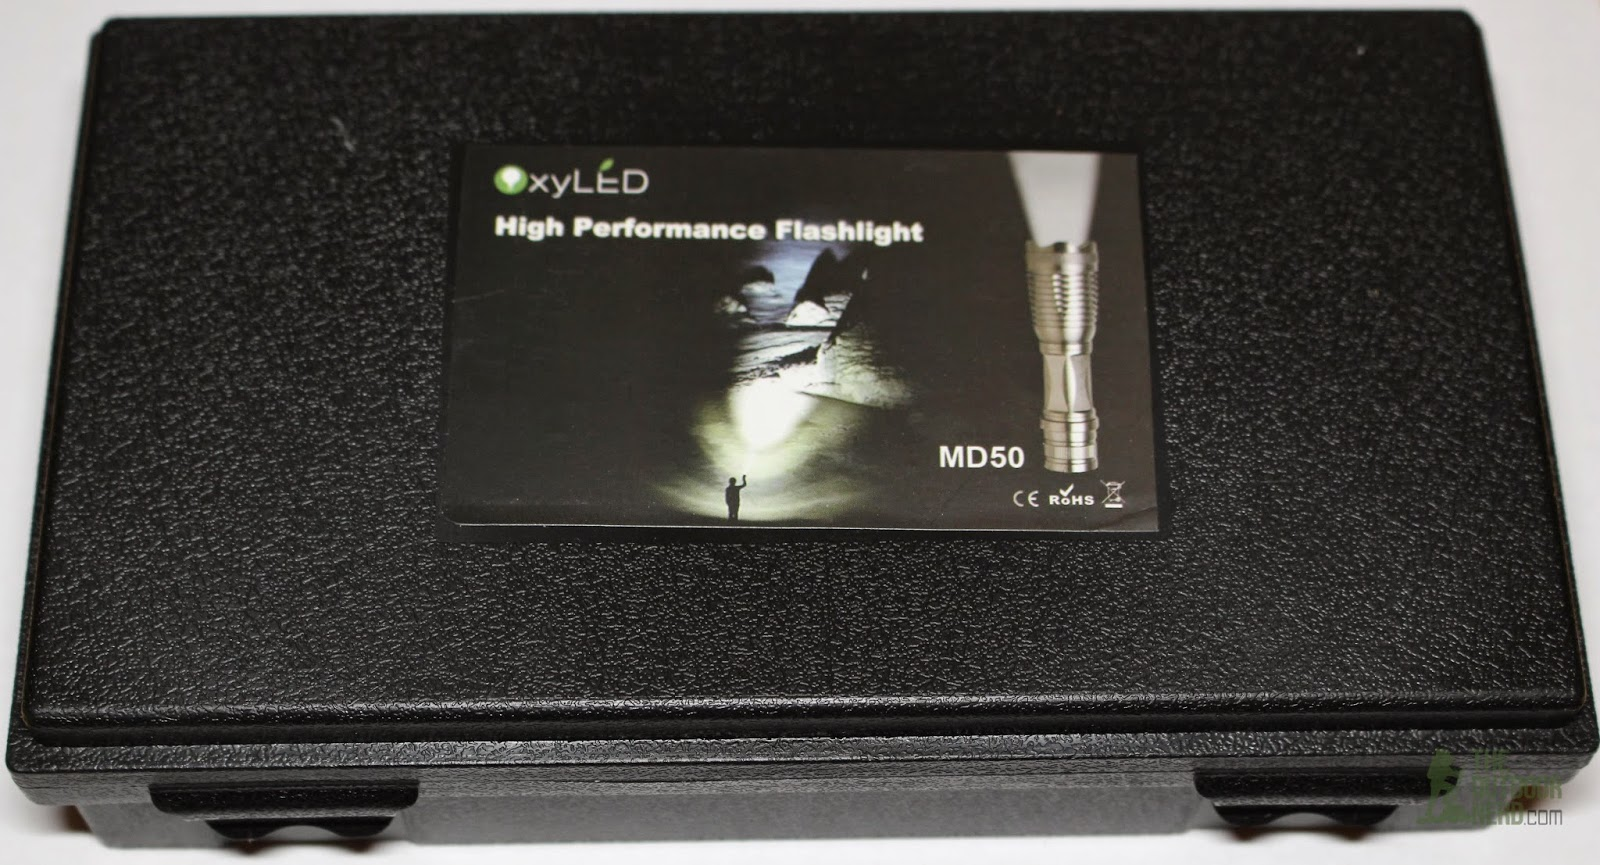 OxyLED MD50 Flashlight Kit - In Box 1